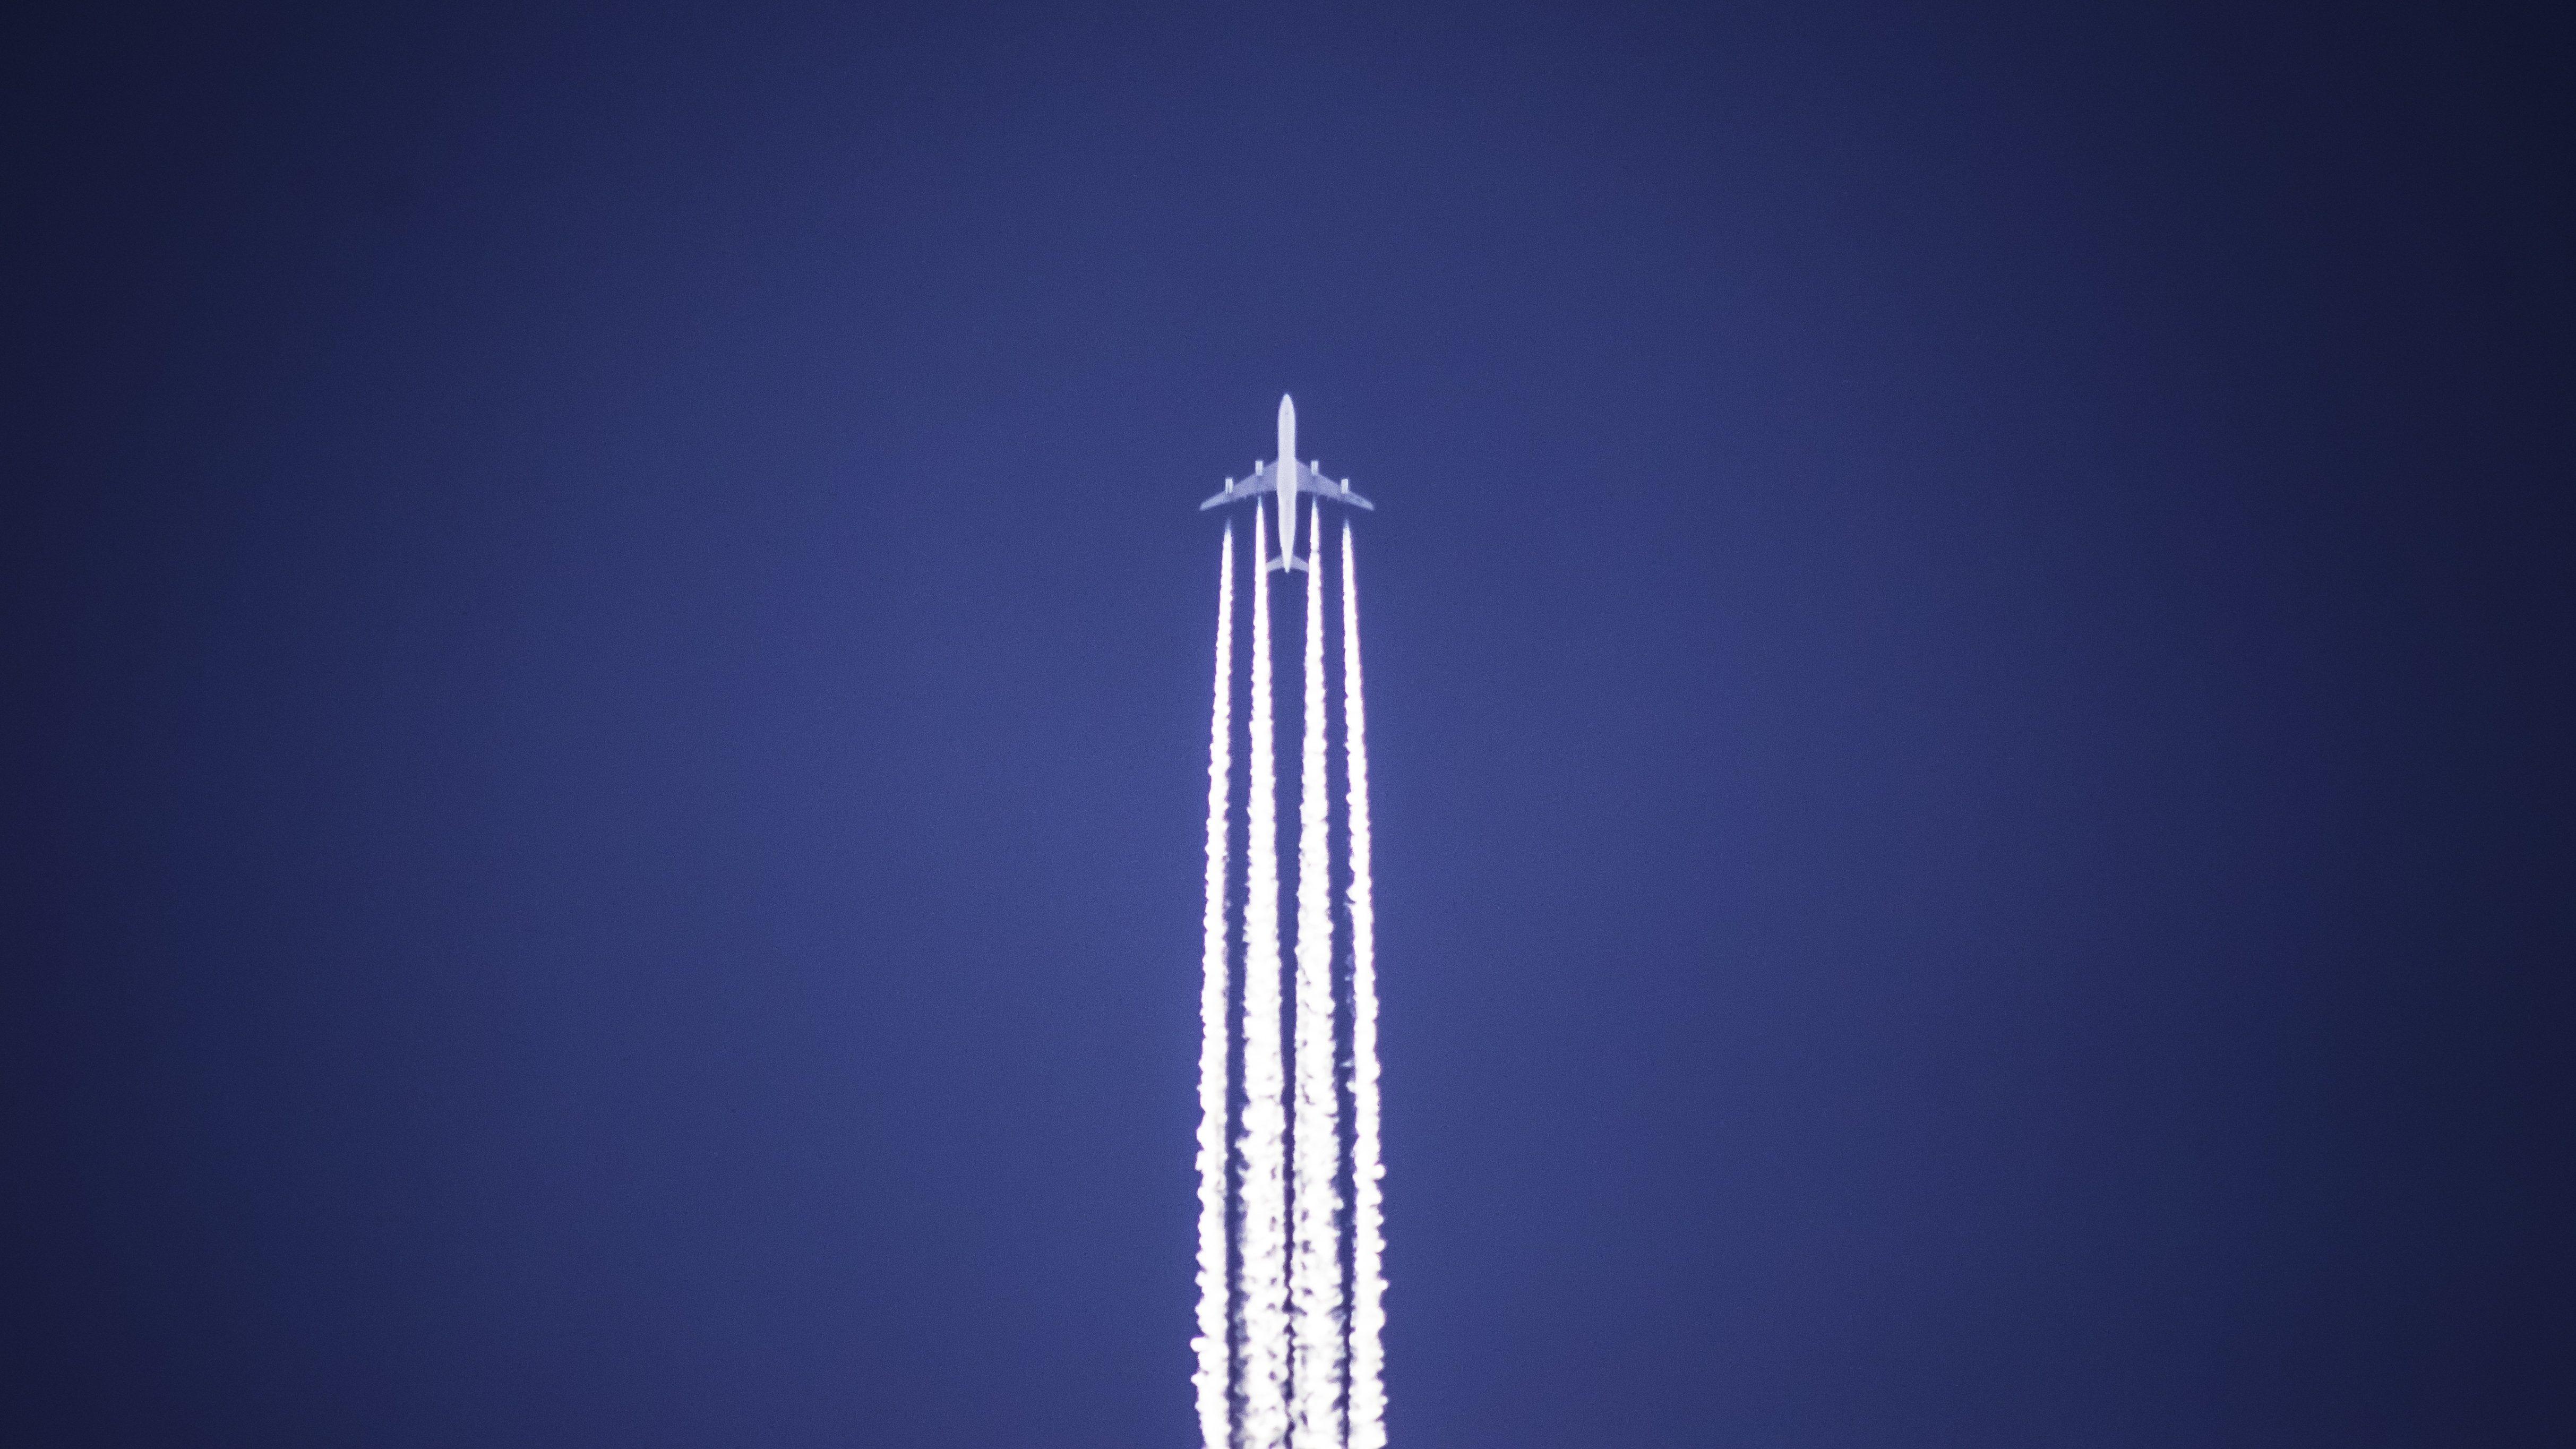 the-plane-1314551